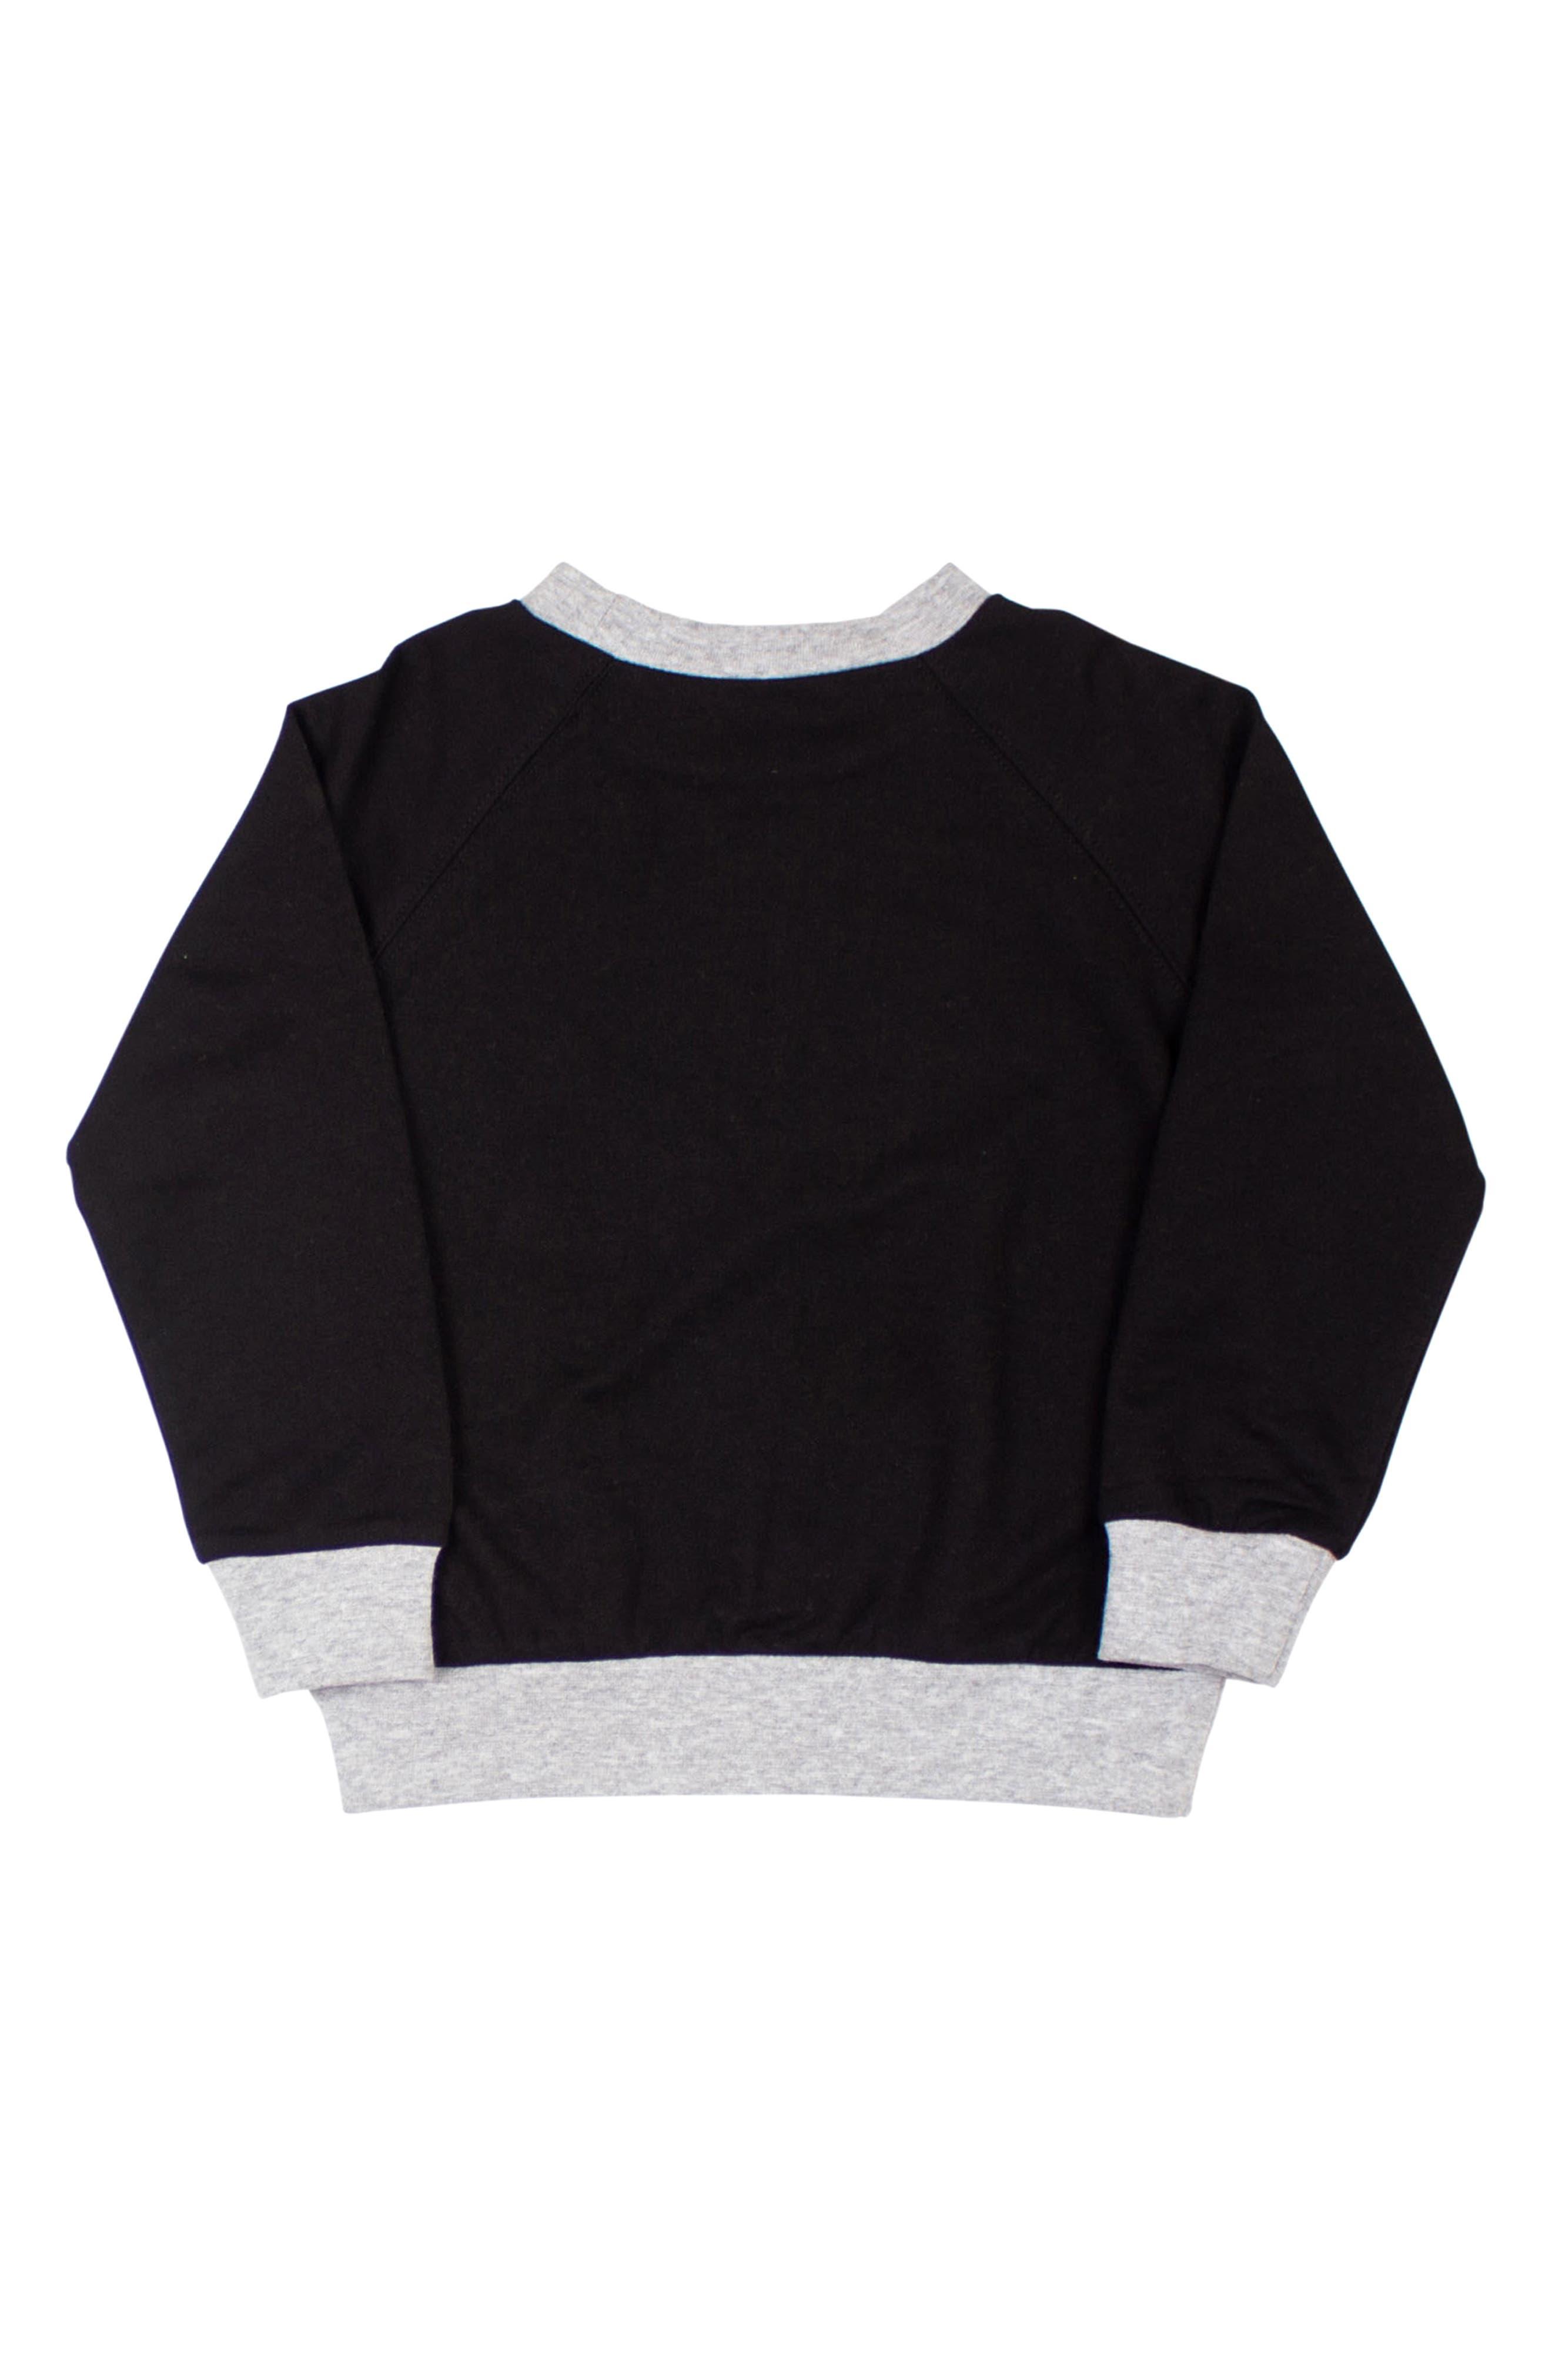 Boys of Awesome Sweatshirt,                             Alternate thumbnail 2, color,                             001